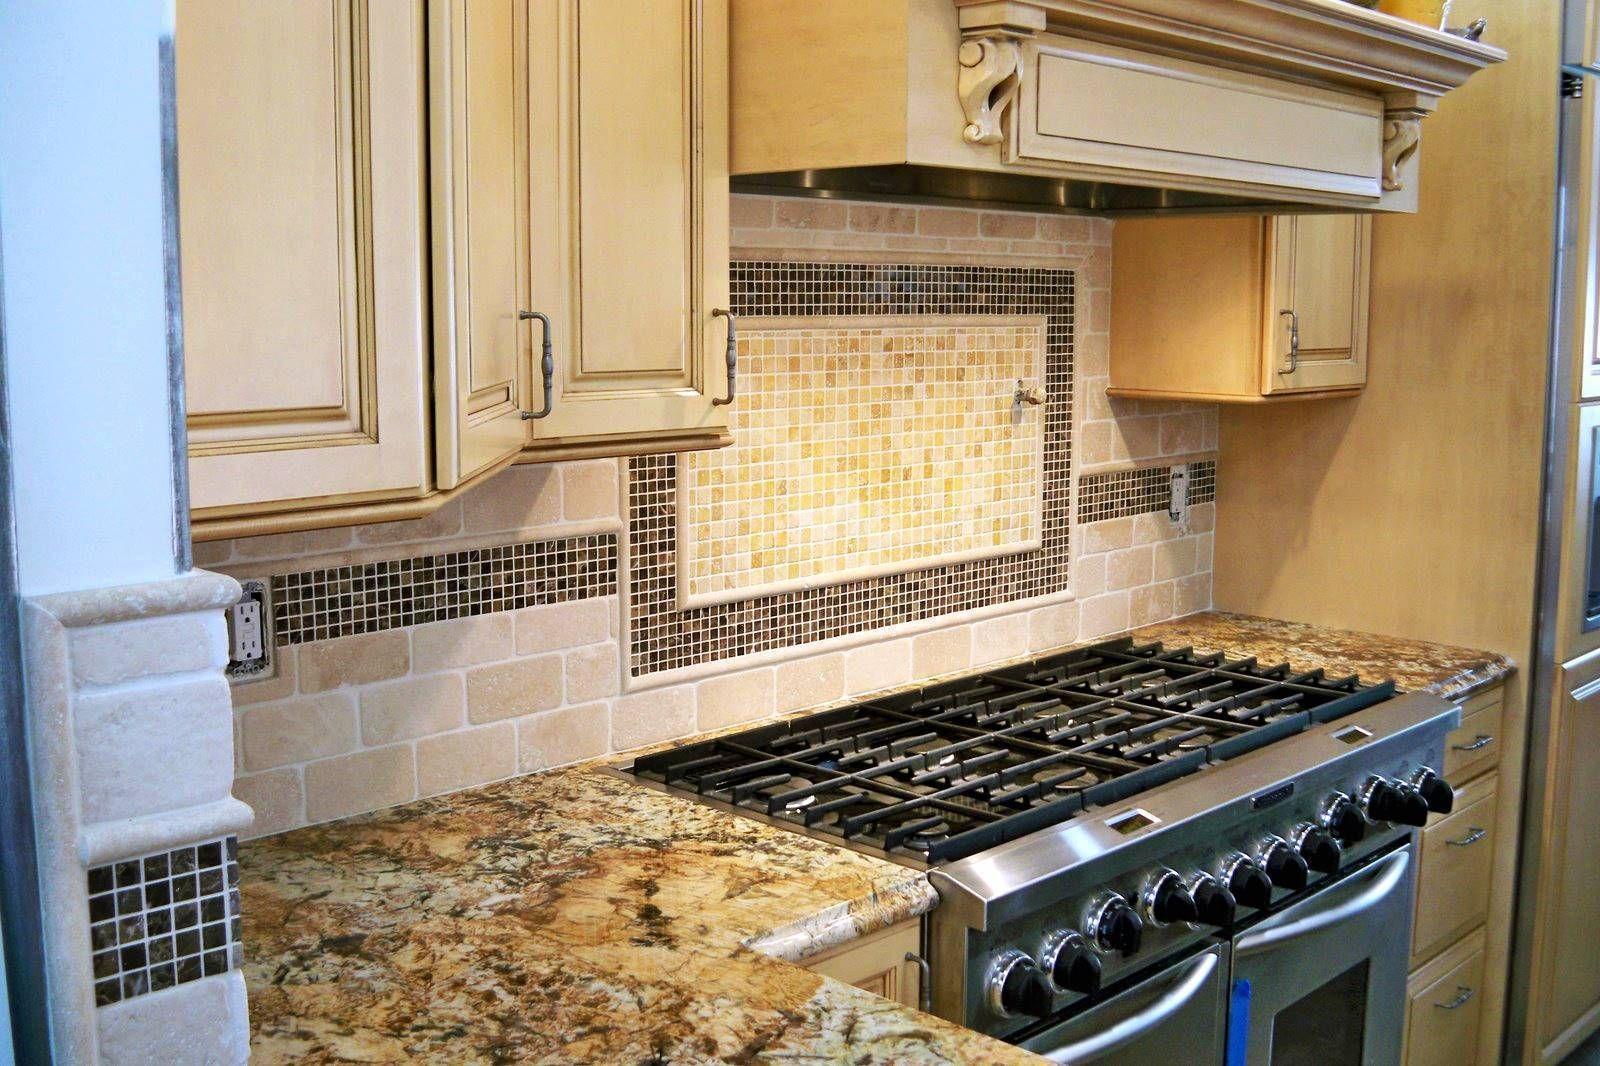 Kitchen Backsplash Tile Ideas Modern Best About Grey Walls Pinterest